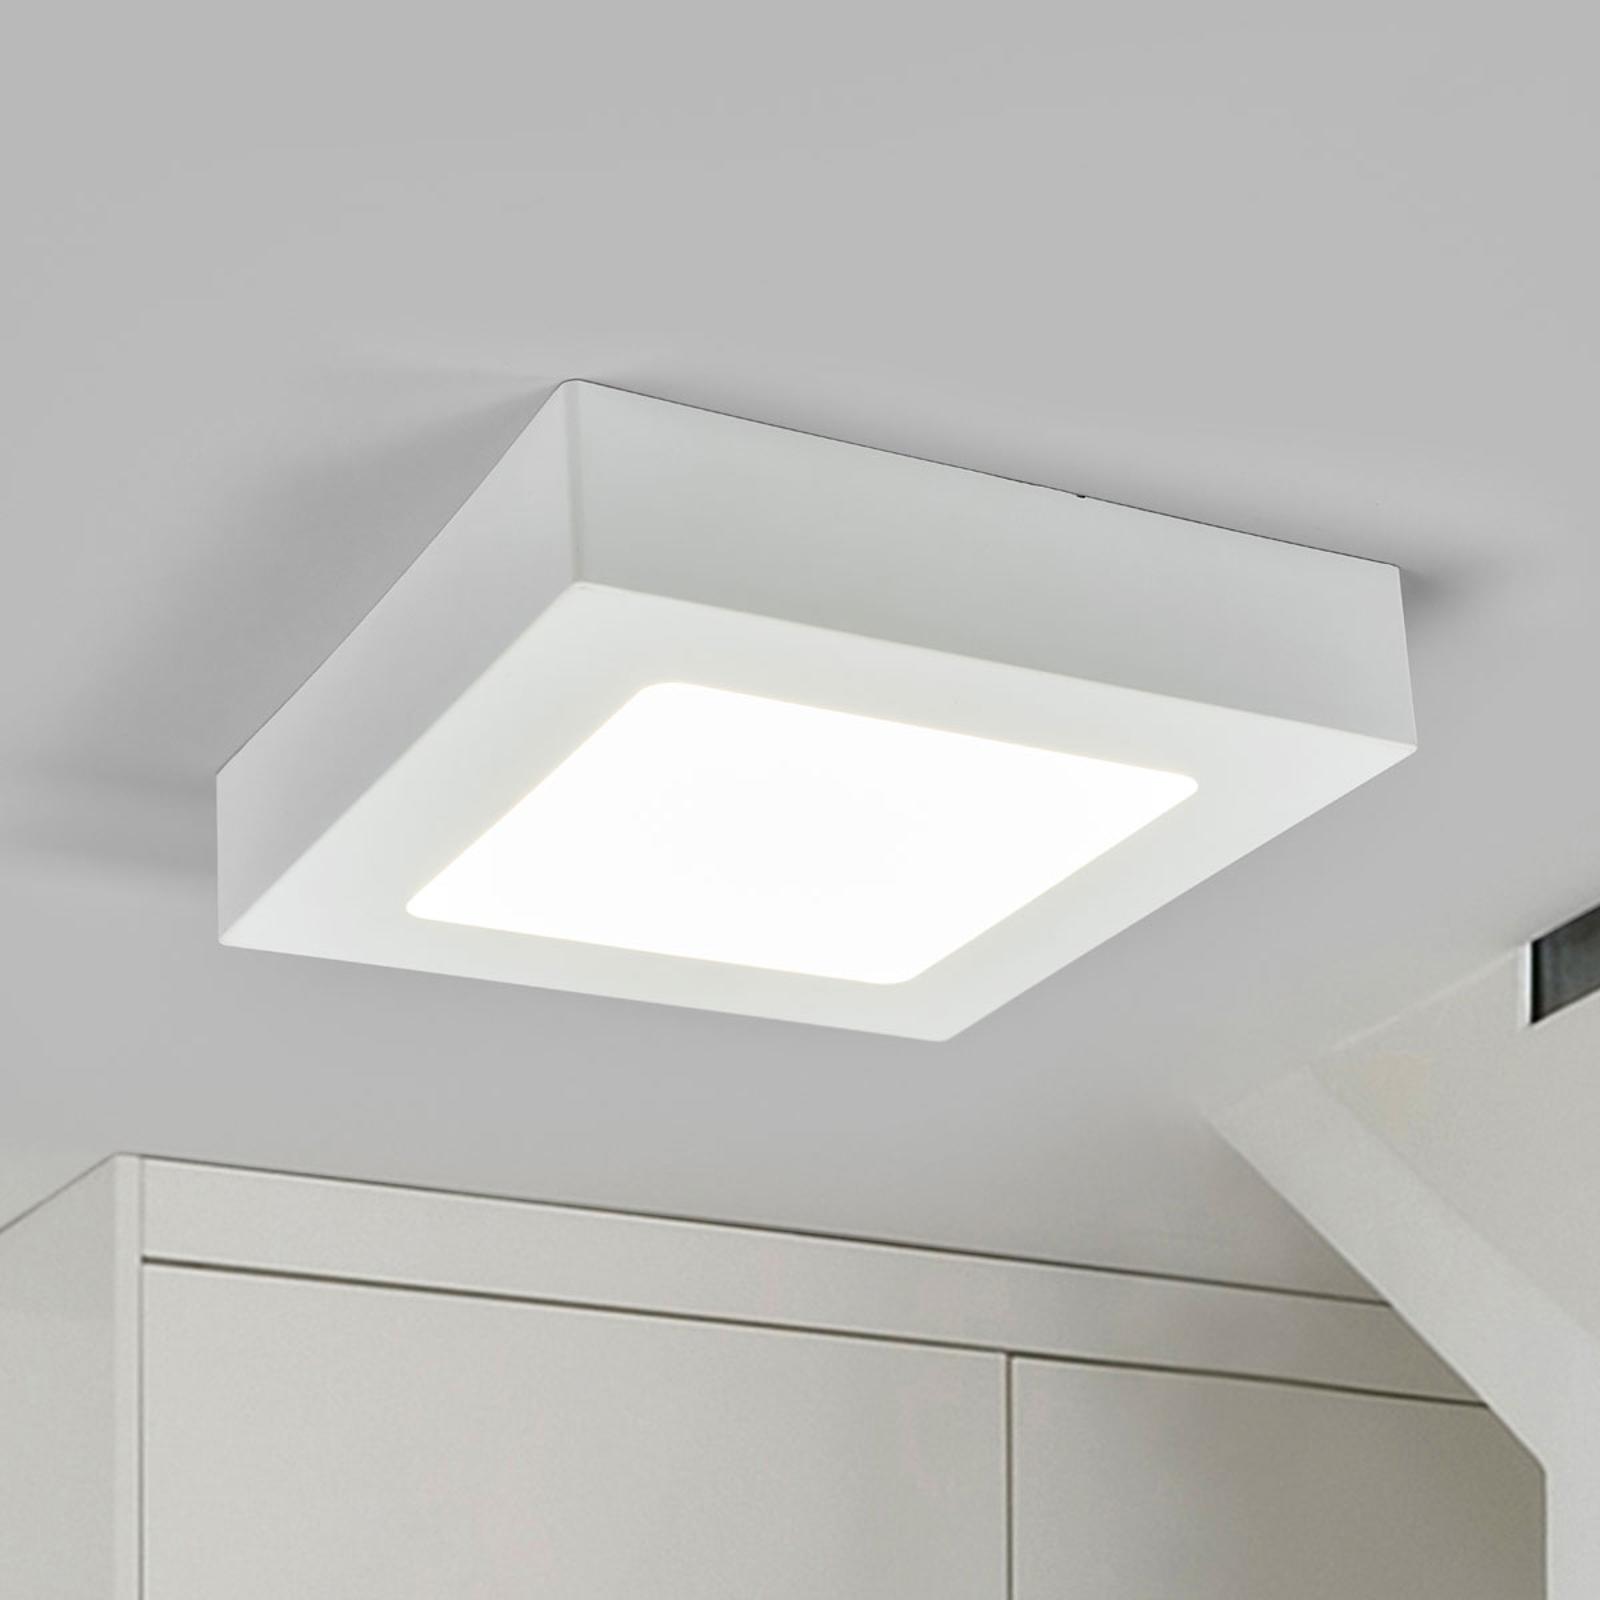 LED-Deckenlampe Marlo weiß 4000K eckig 18,1cm